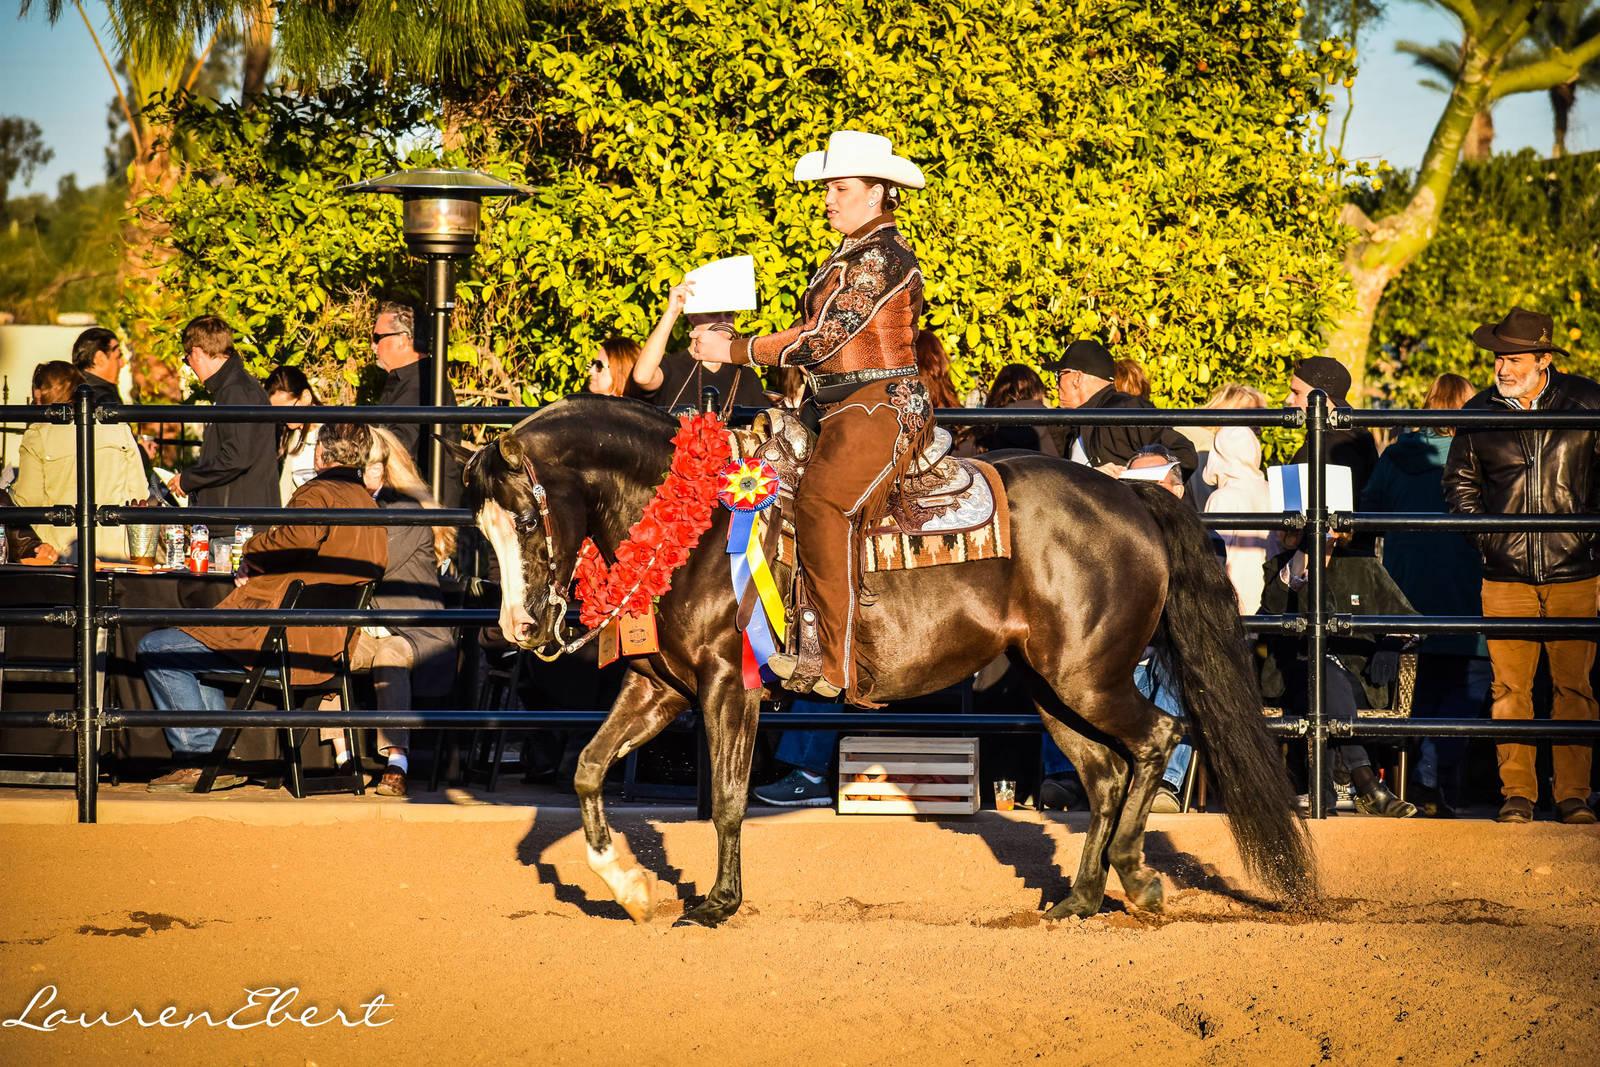 2018 GRK Scottsdale Show Open House